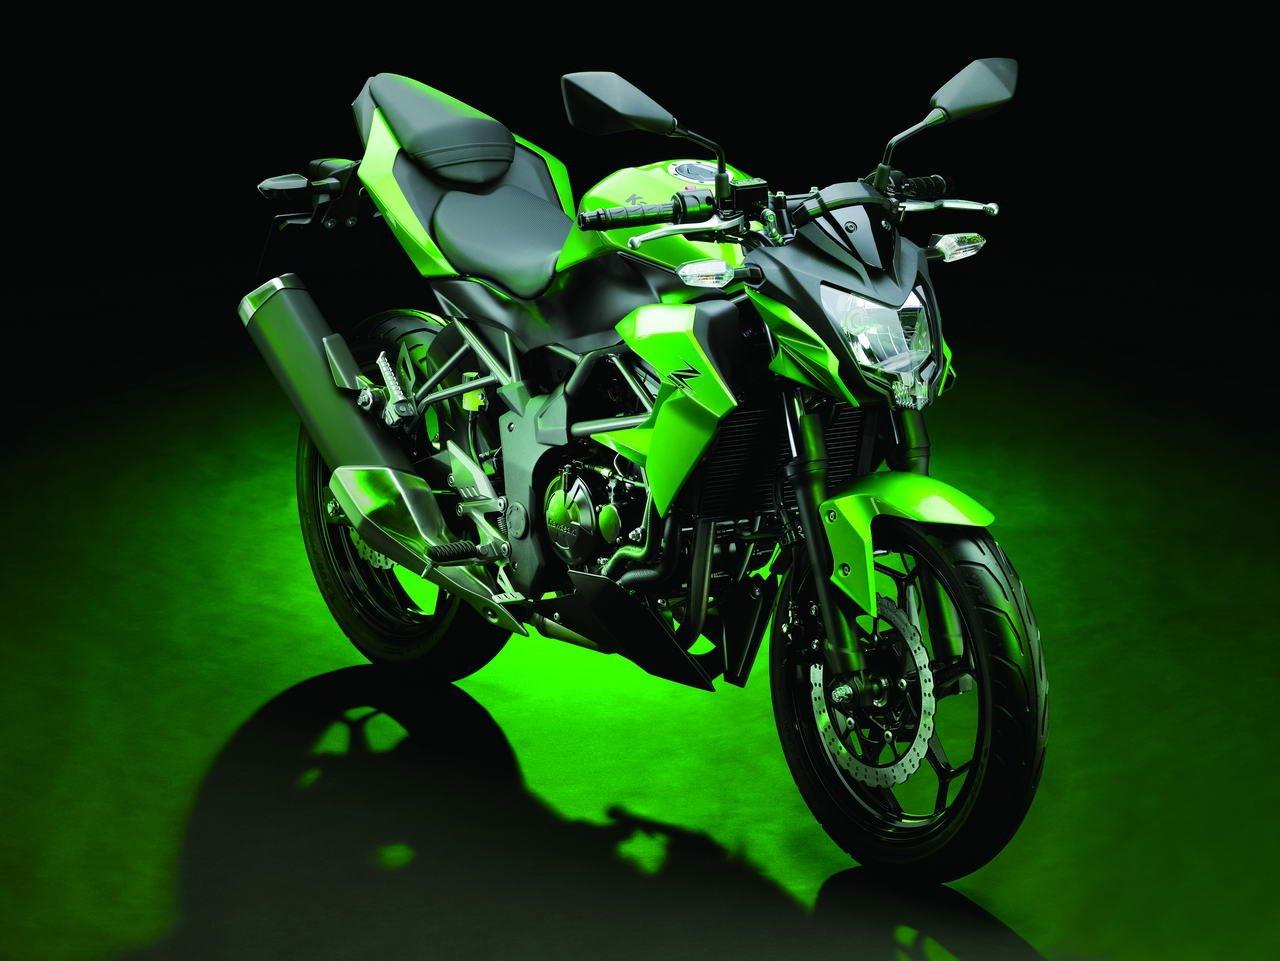 Listino Kawasaki J300 SE Scooter 150-300 - image 15547_1 on http://moto.motori.net